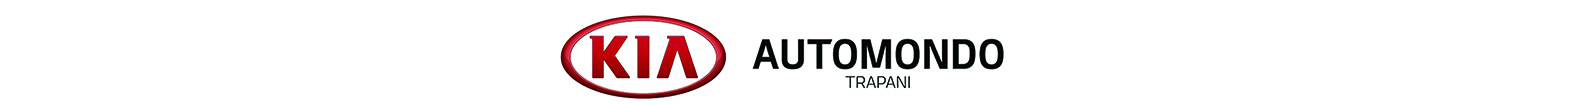 Automondo Testata web